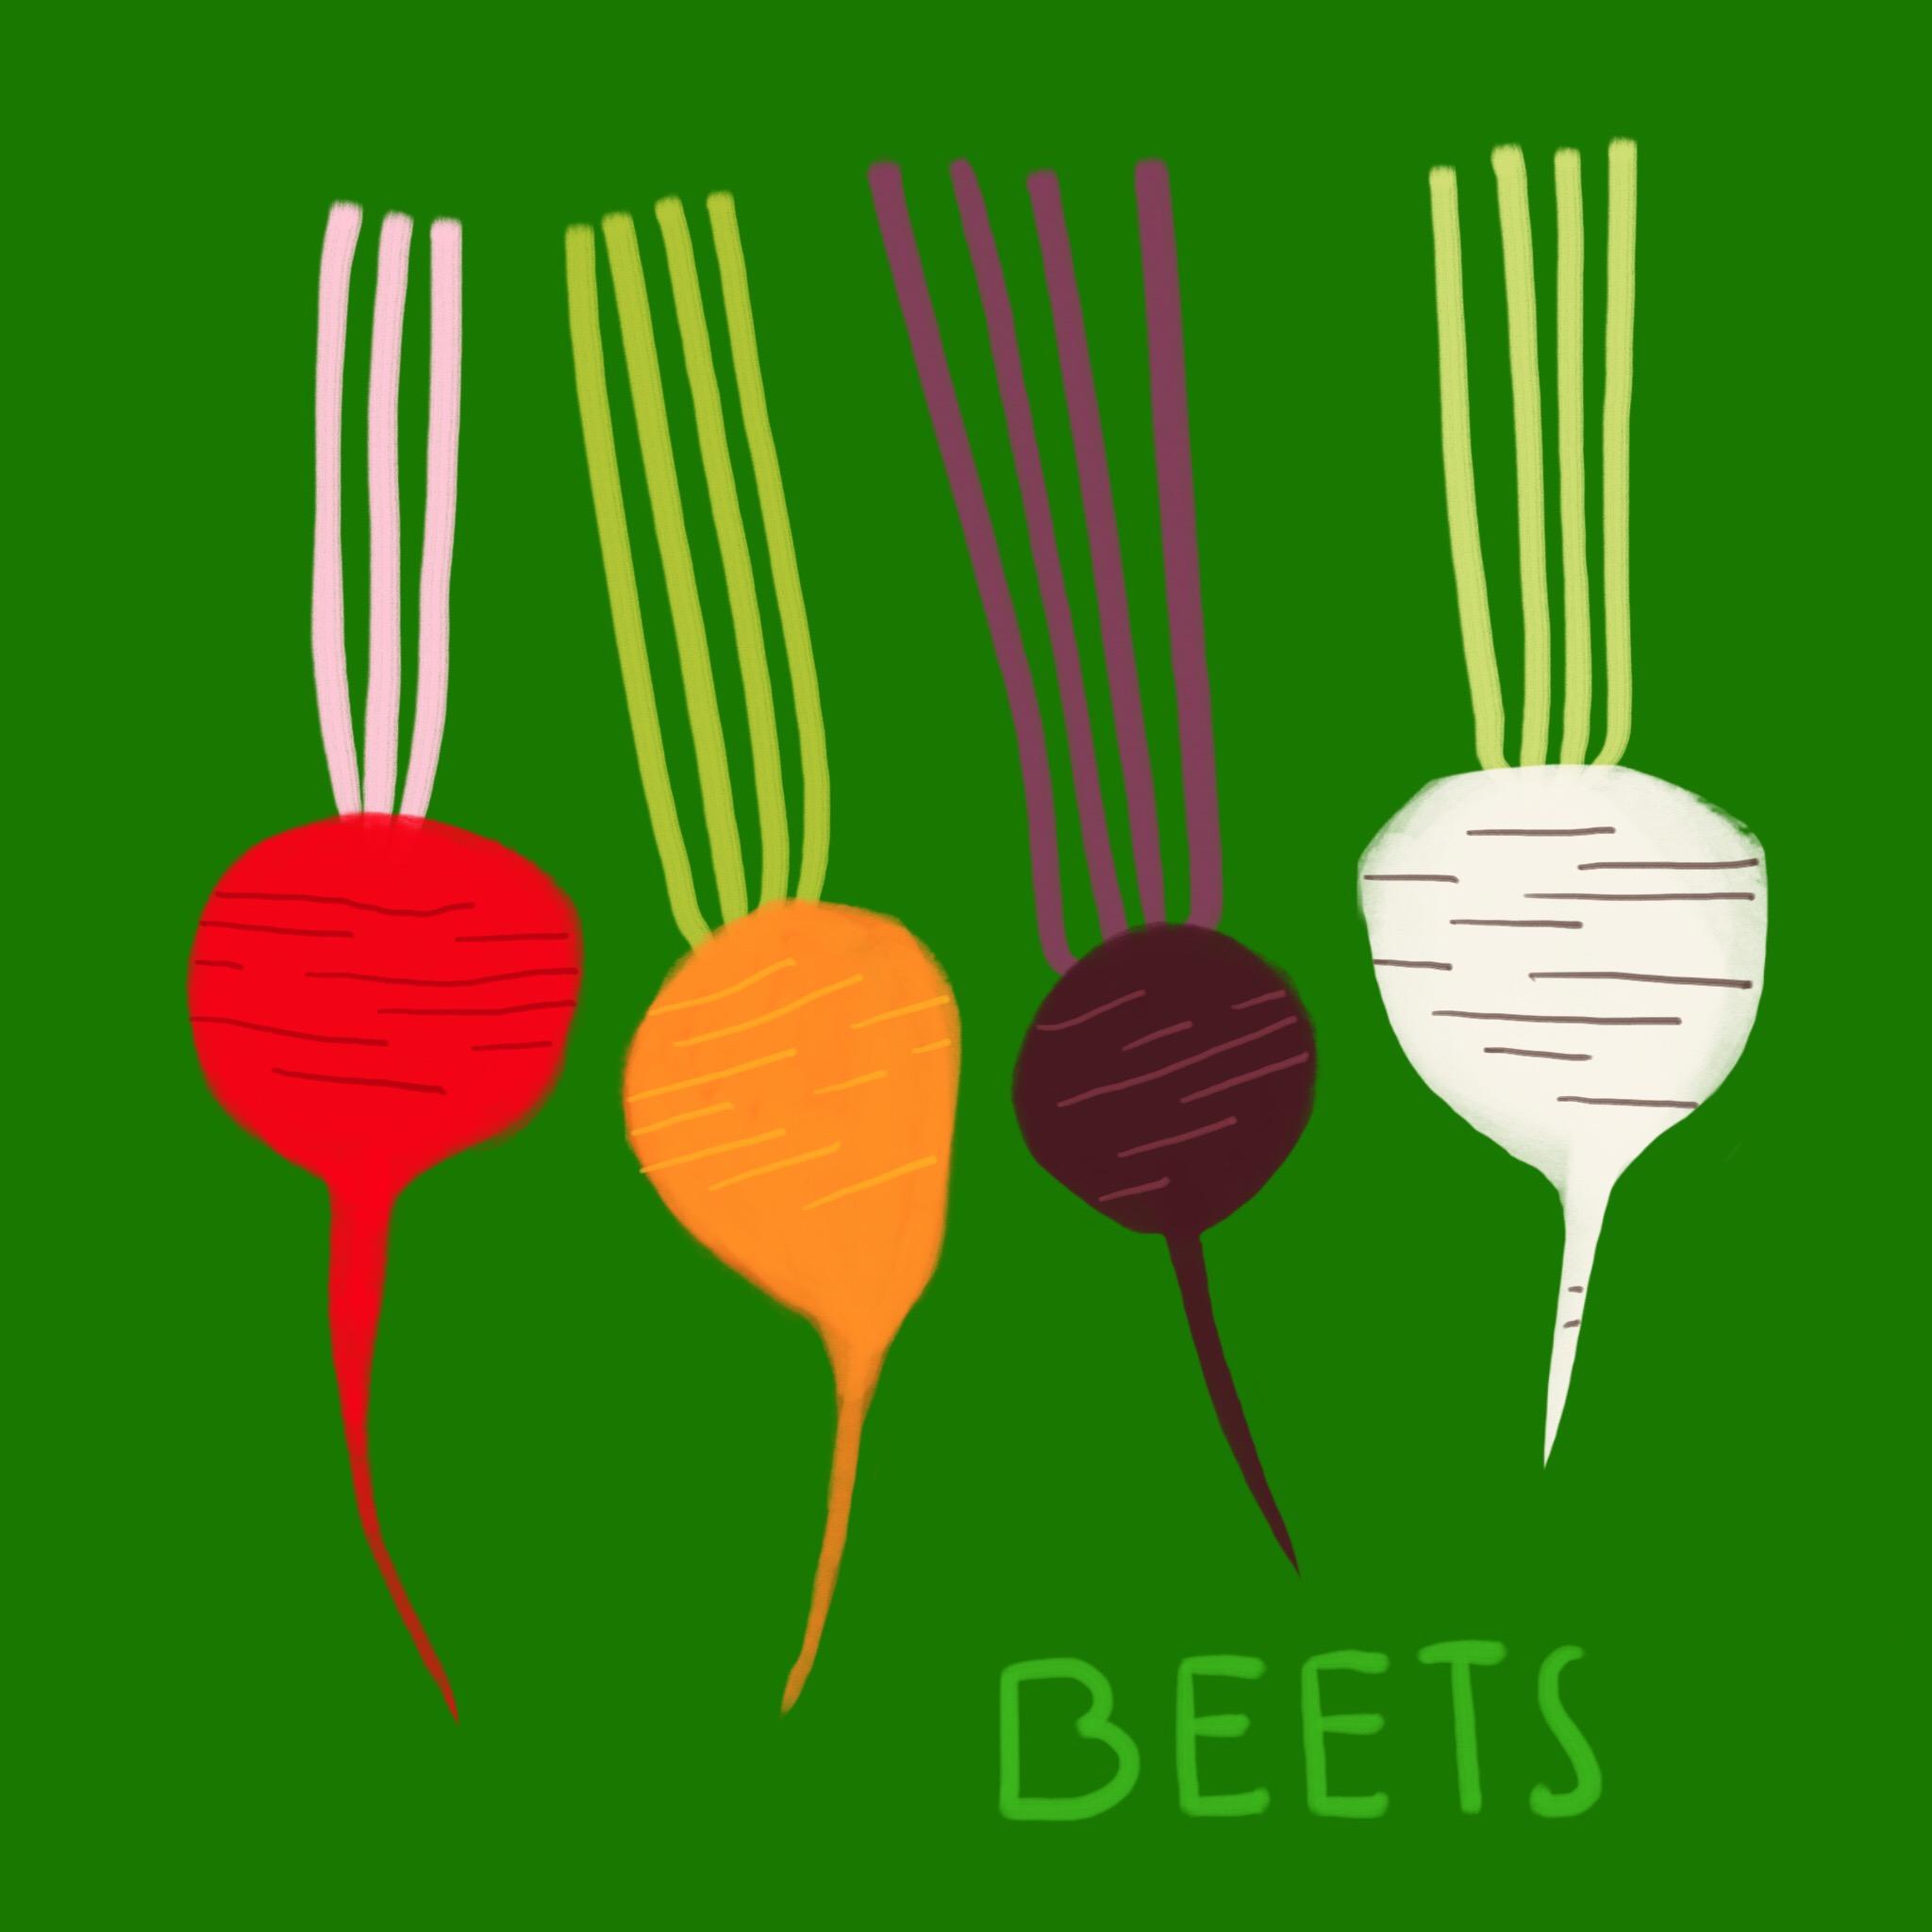 50_-_Beets.jpg